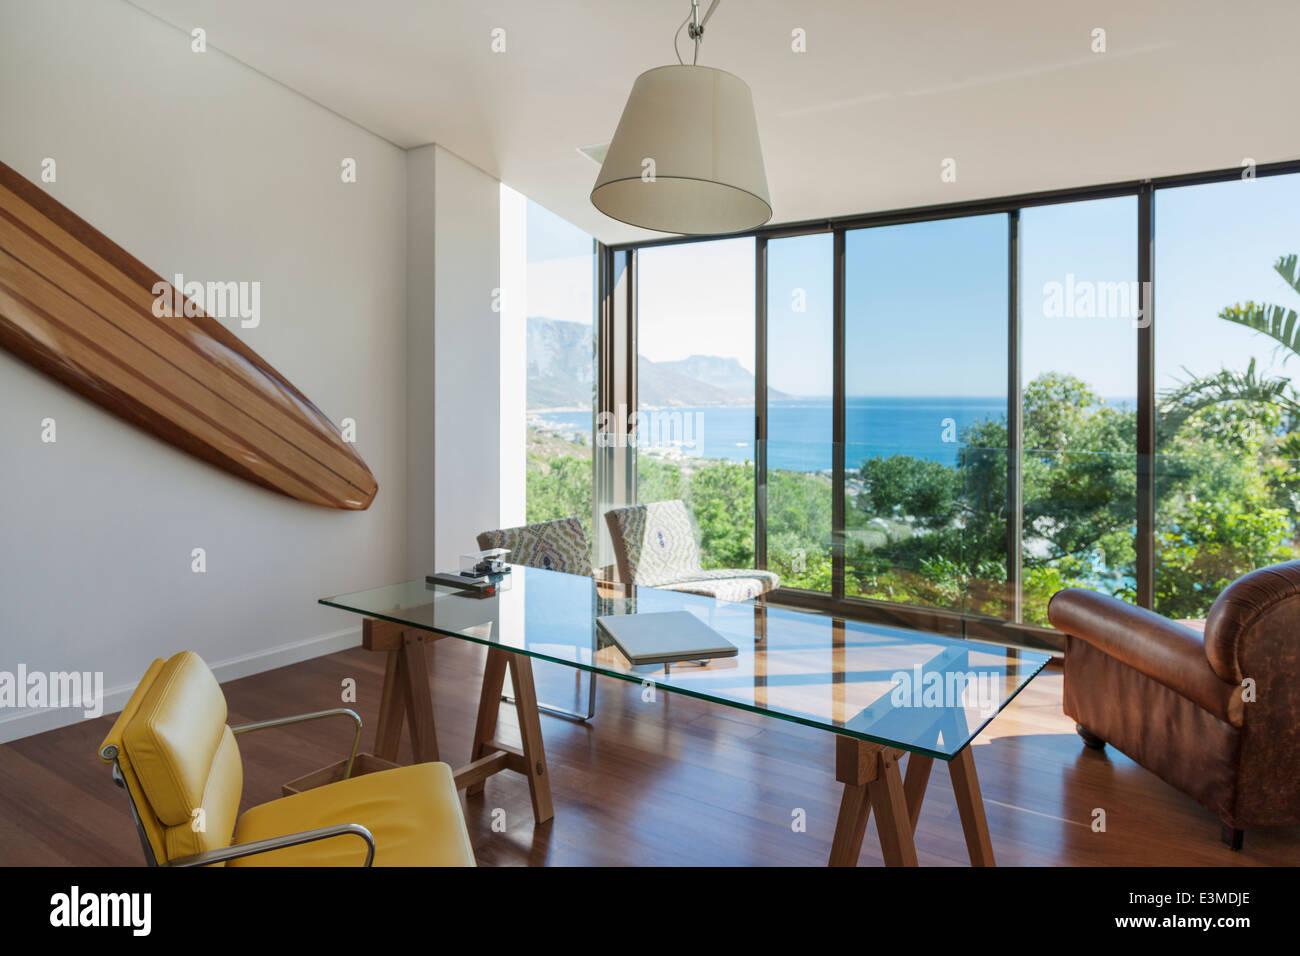 Moderne home-Office mit Blick aufs Meer Stockfoto, Bild: 71135190 ...